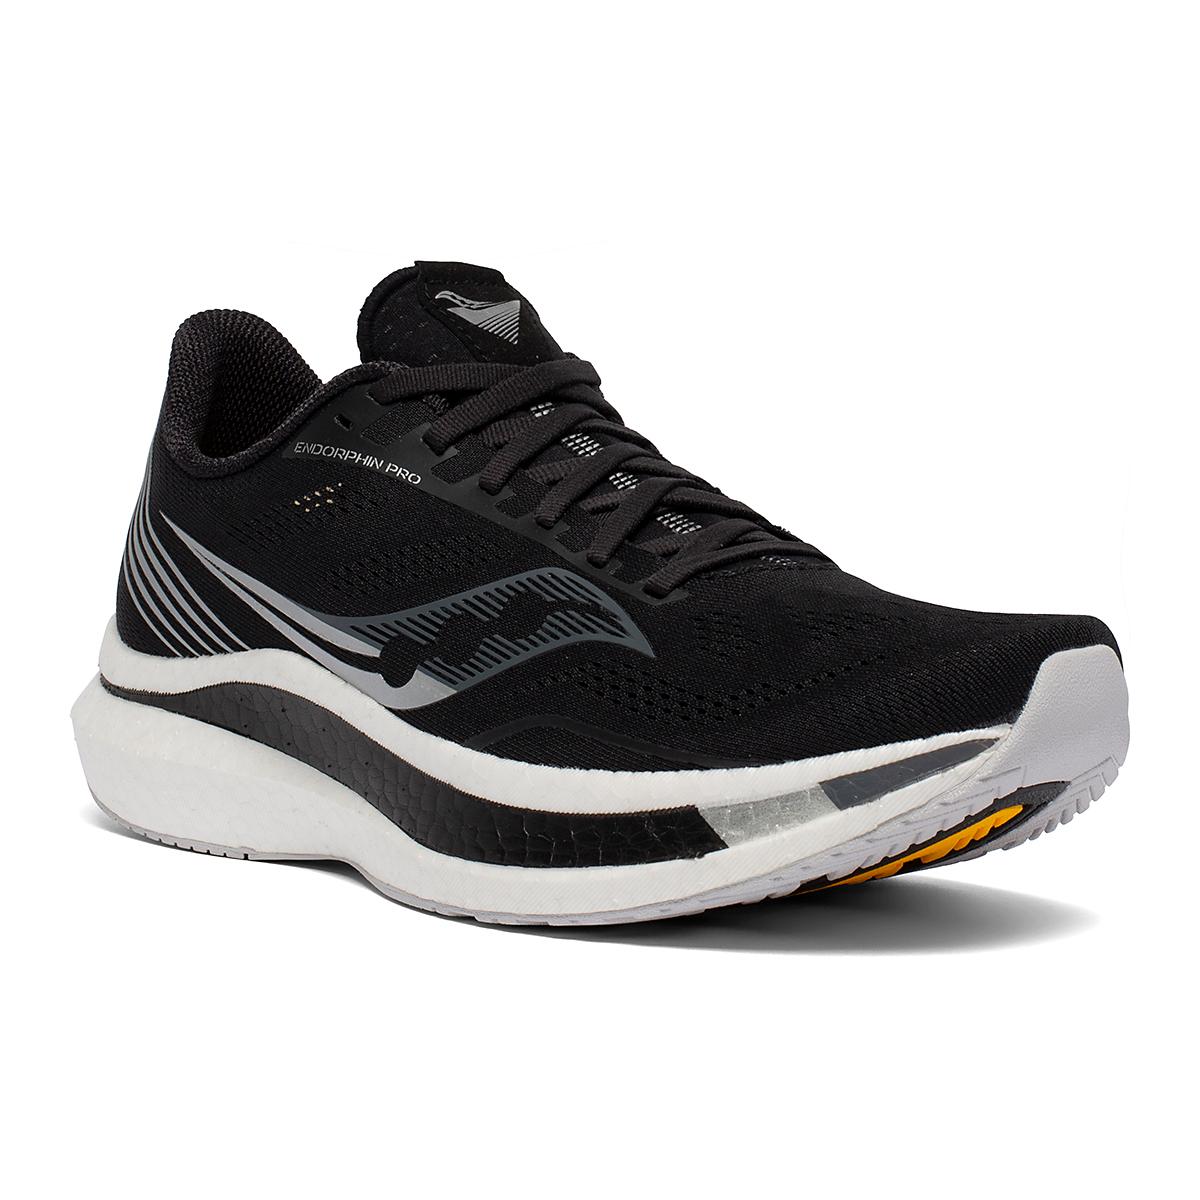 Men's Saucony Endorphin Pro Running Shoe - Color: Black/Silver - Size: 7 - Width: Regular, Black/Silver, large, image 3